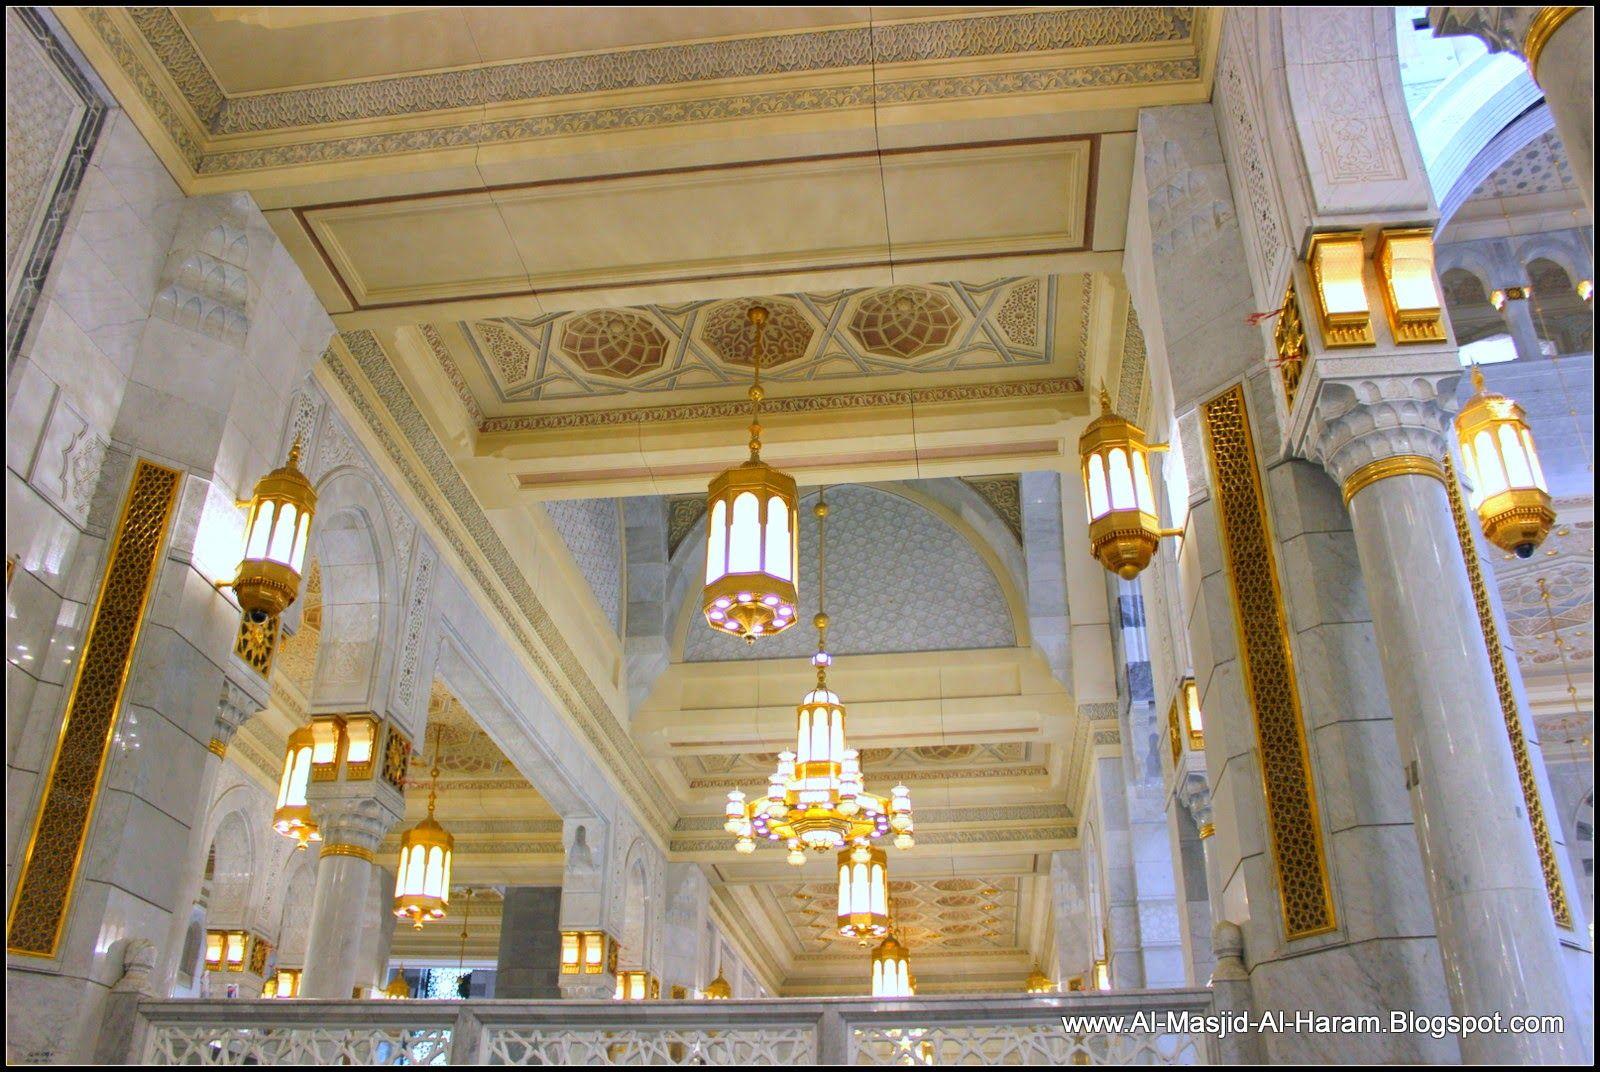 Subhanallah Indahnya Dekorasi Interior Masjidil Haram